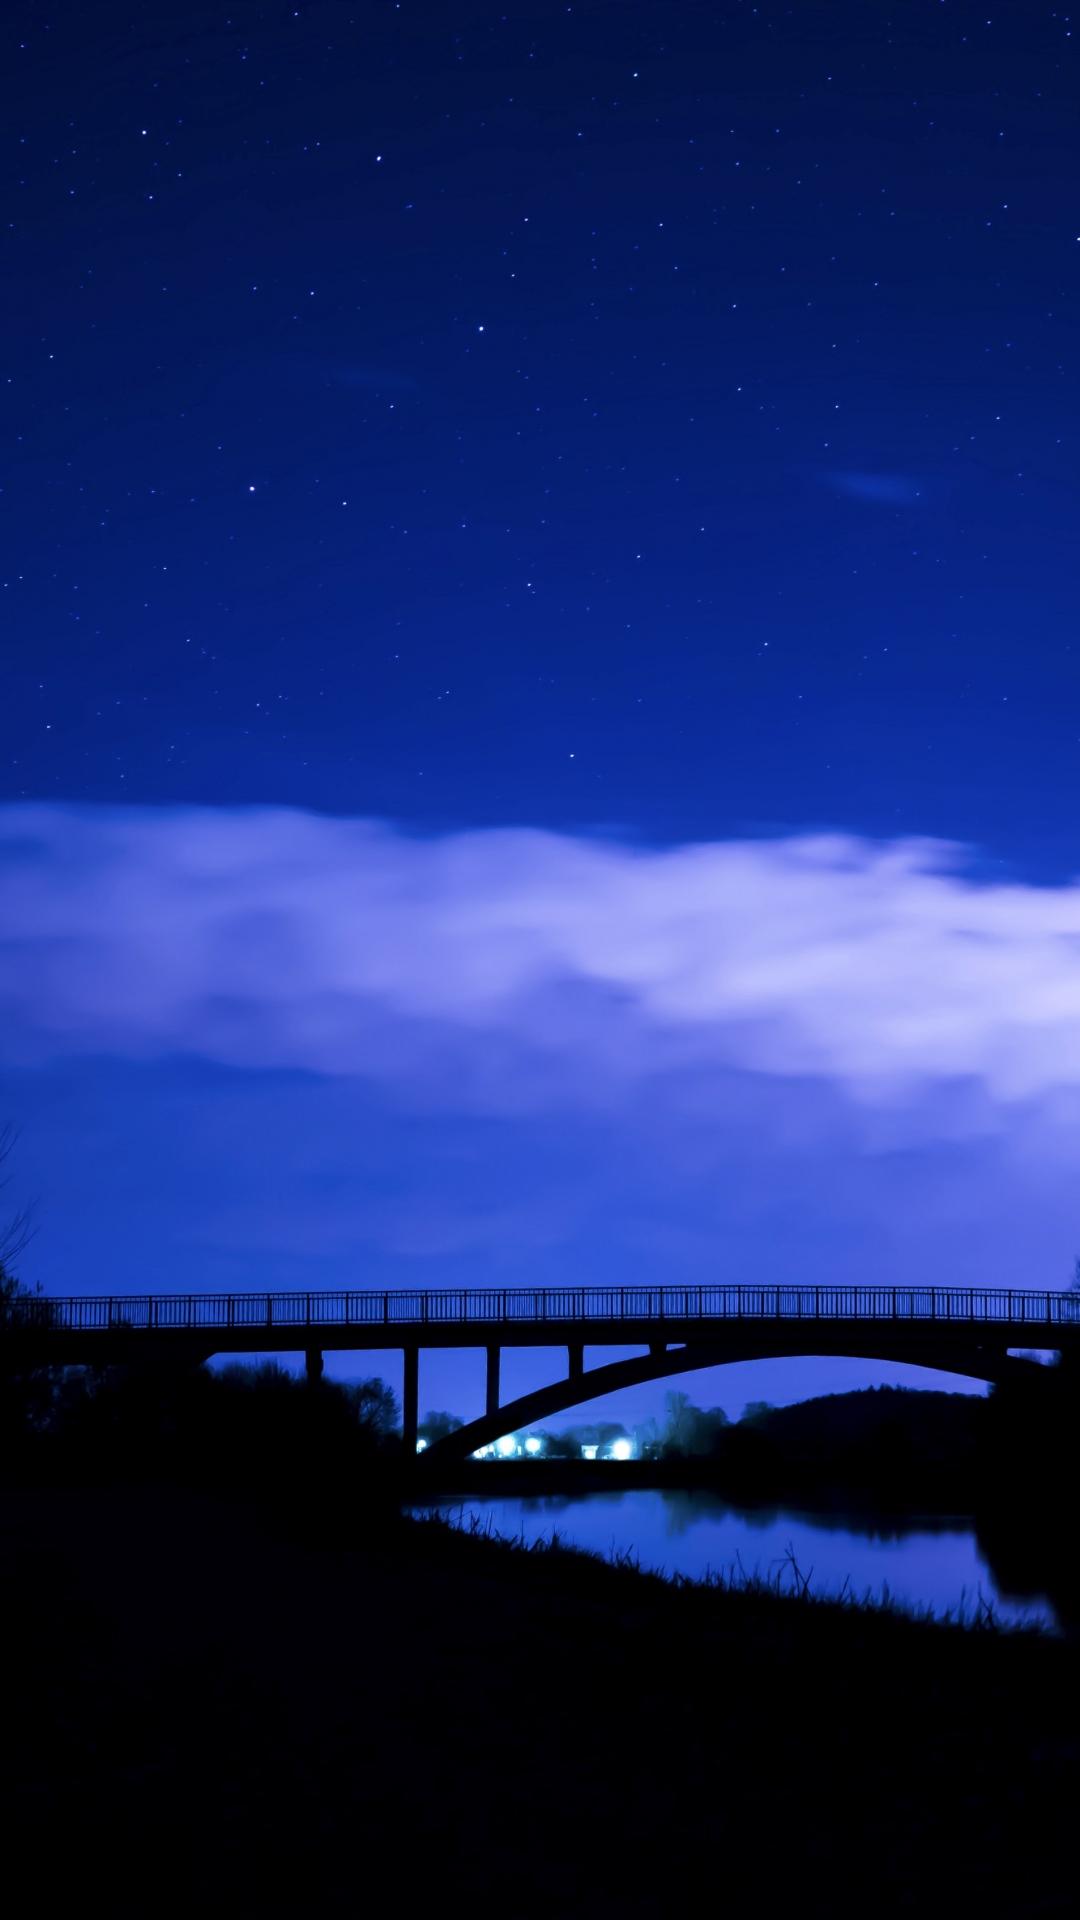 iphone wallpaper bridge night Bridge